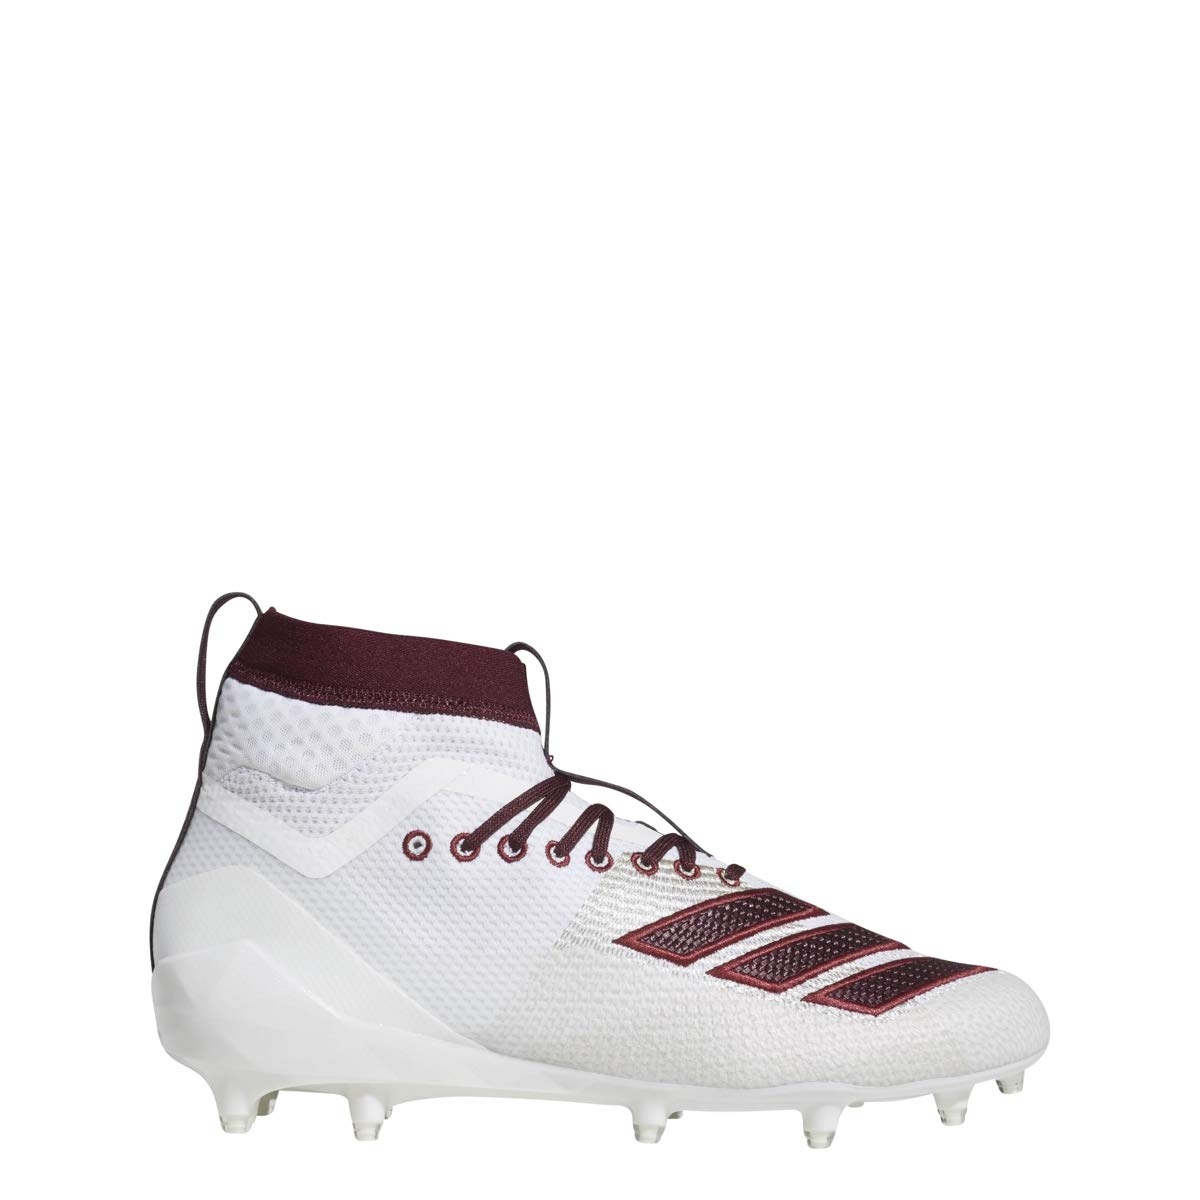 adidas Men's Adizero 8.0 SK Football Shoe, White/Maroon/Collegiate Burgundy, 6.5 M US